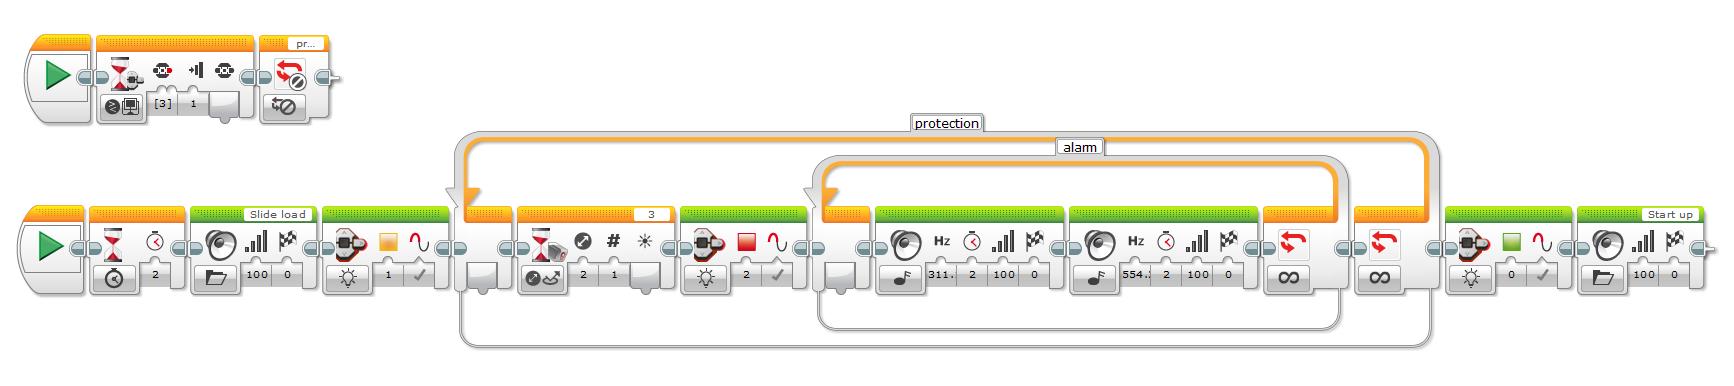 MindstormsEV3_SecretButtonDeactivation